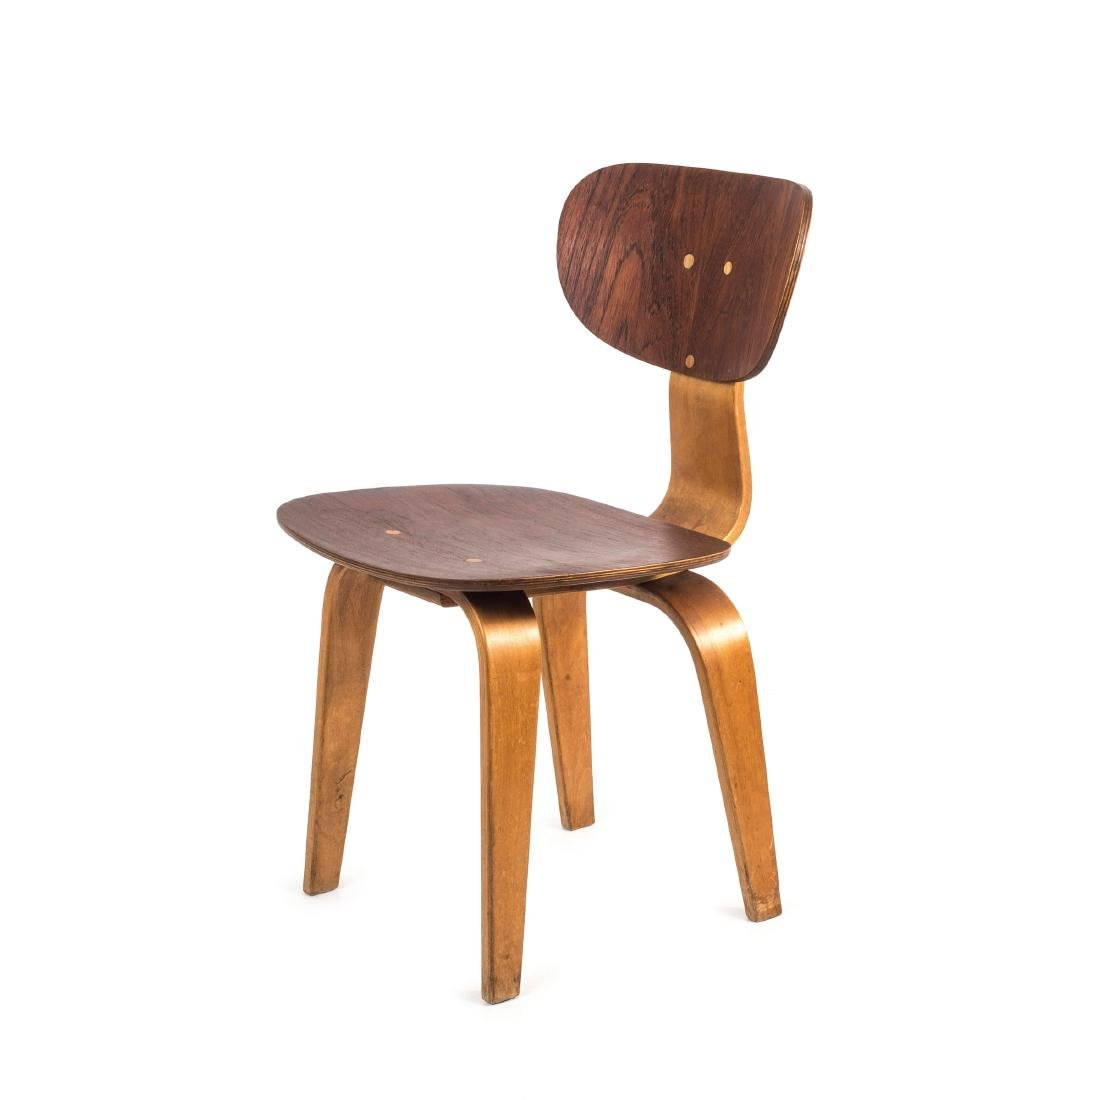 Four 'SB16' chairs, 1955